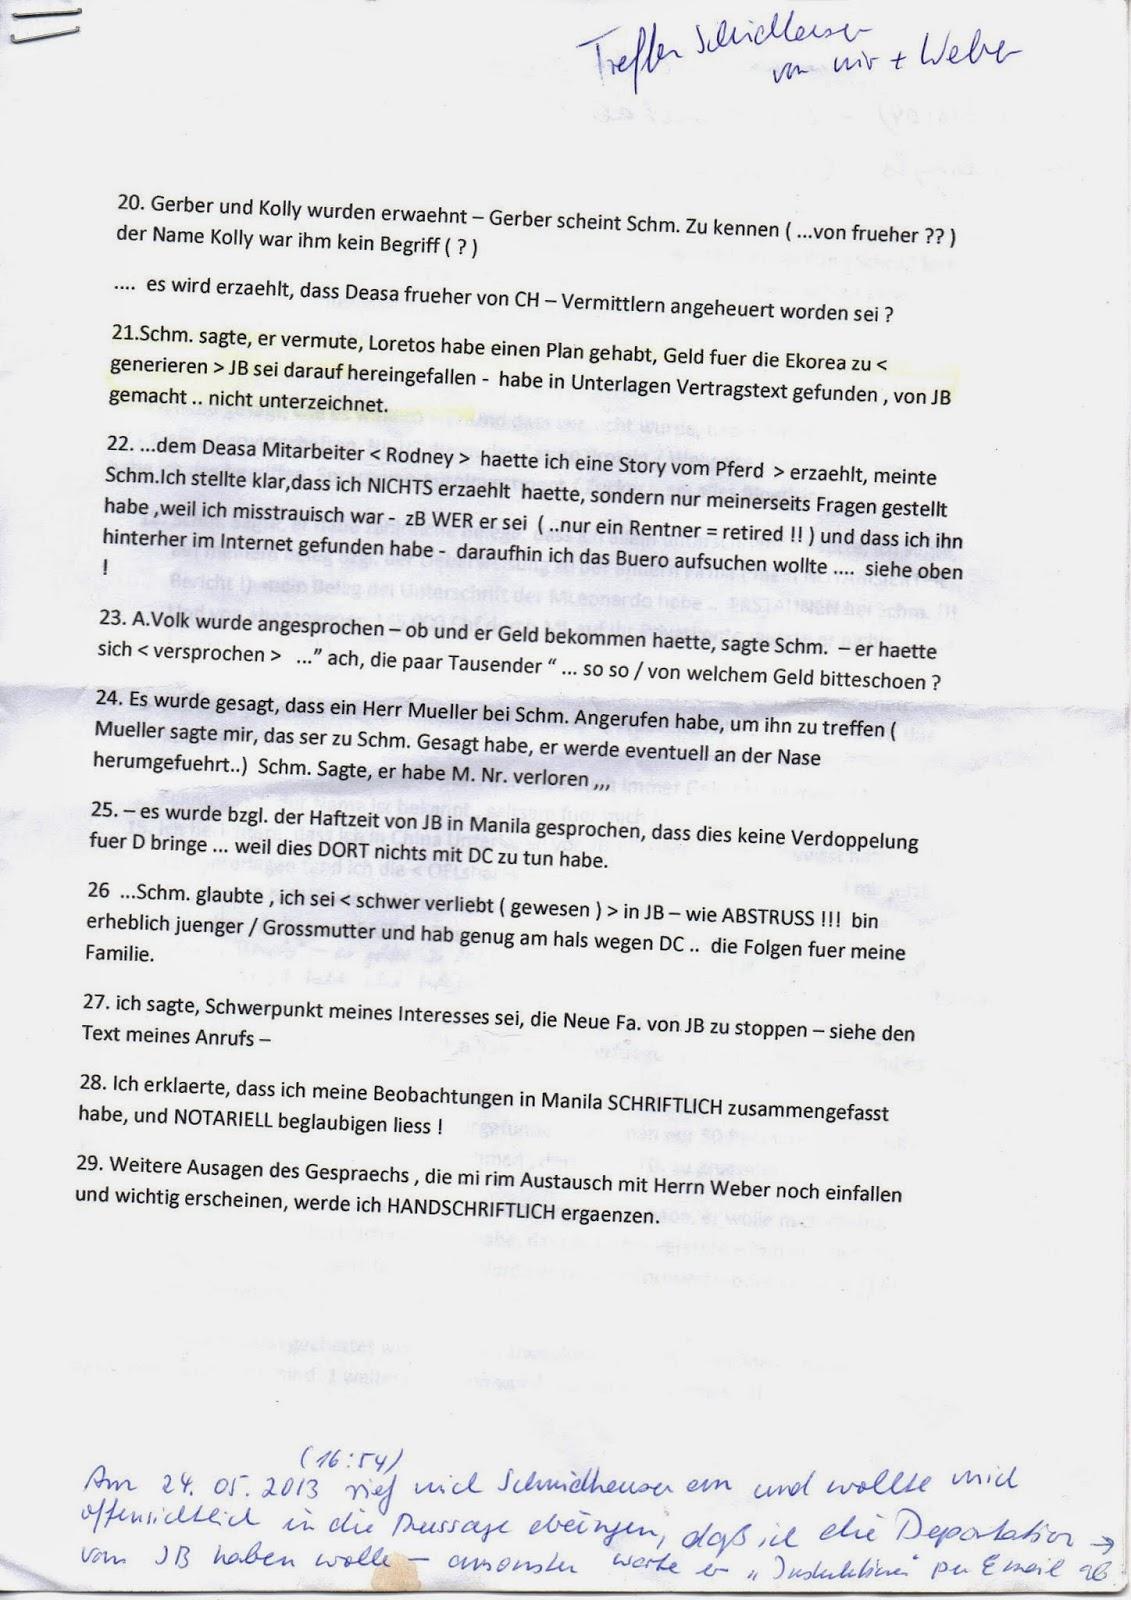 firmeninterne dokumente zitieren